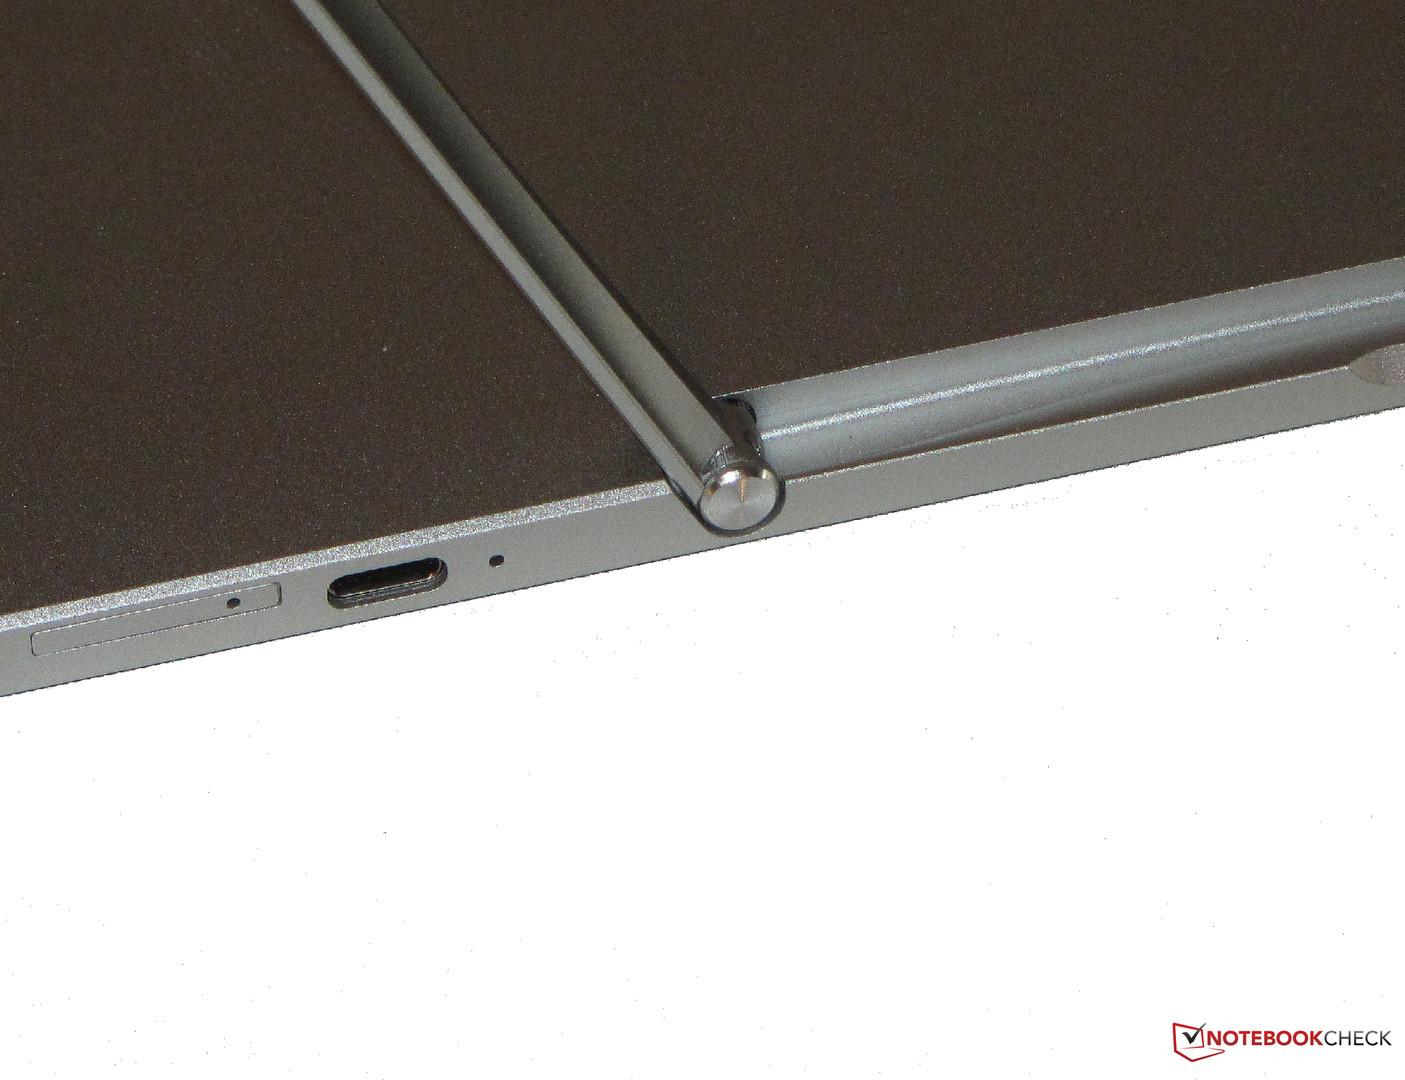 HP Elite x2 1012 G1 Convertible Review - NotebookCheck.net Reviews